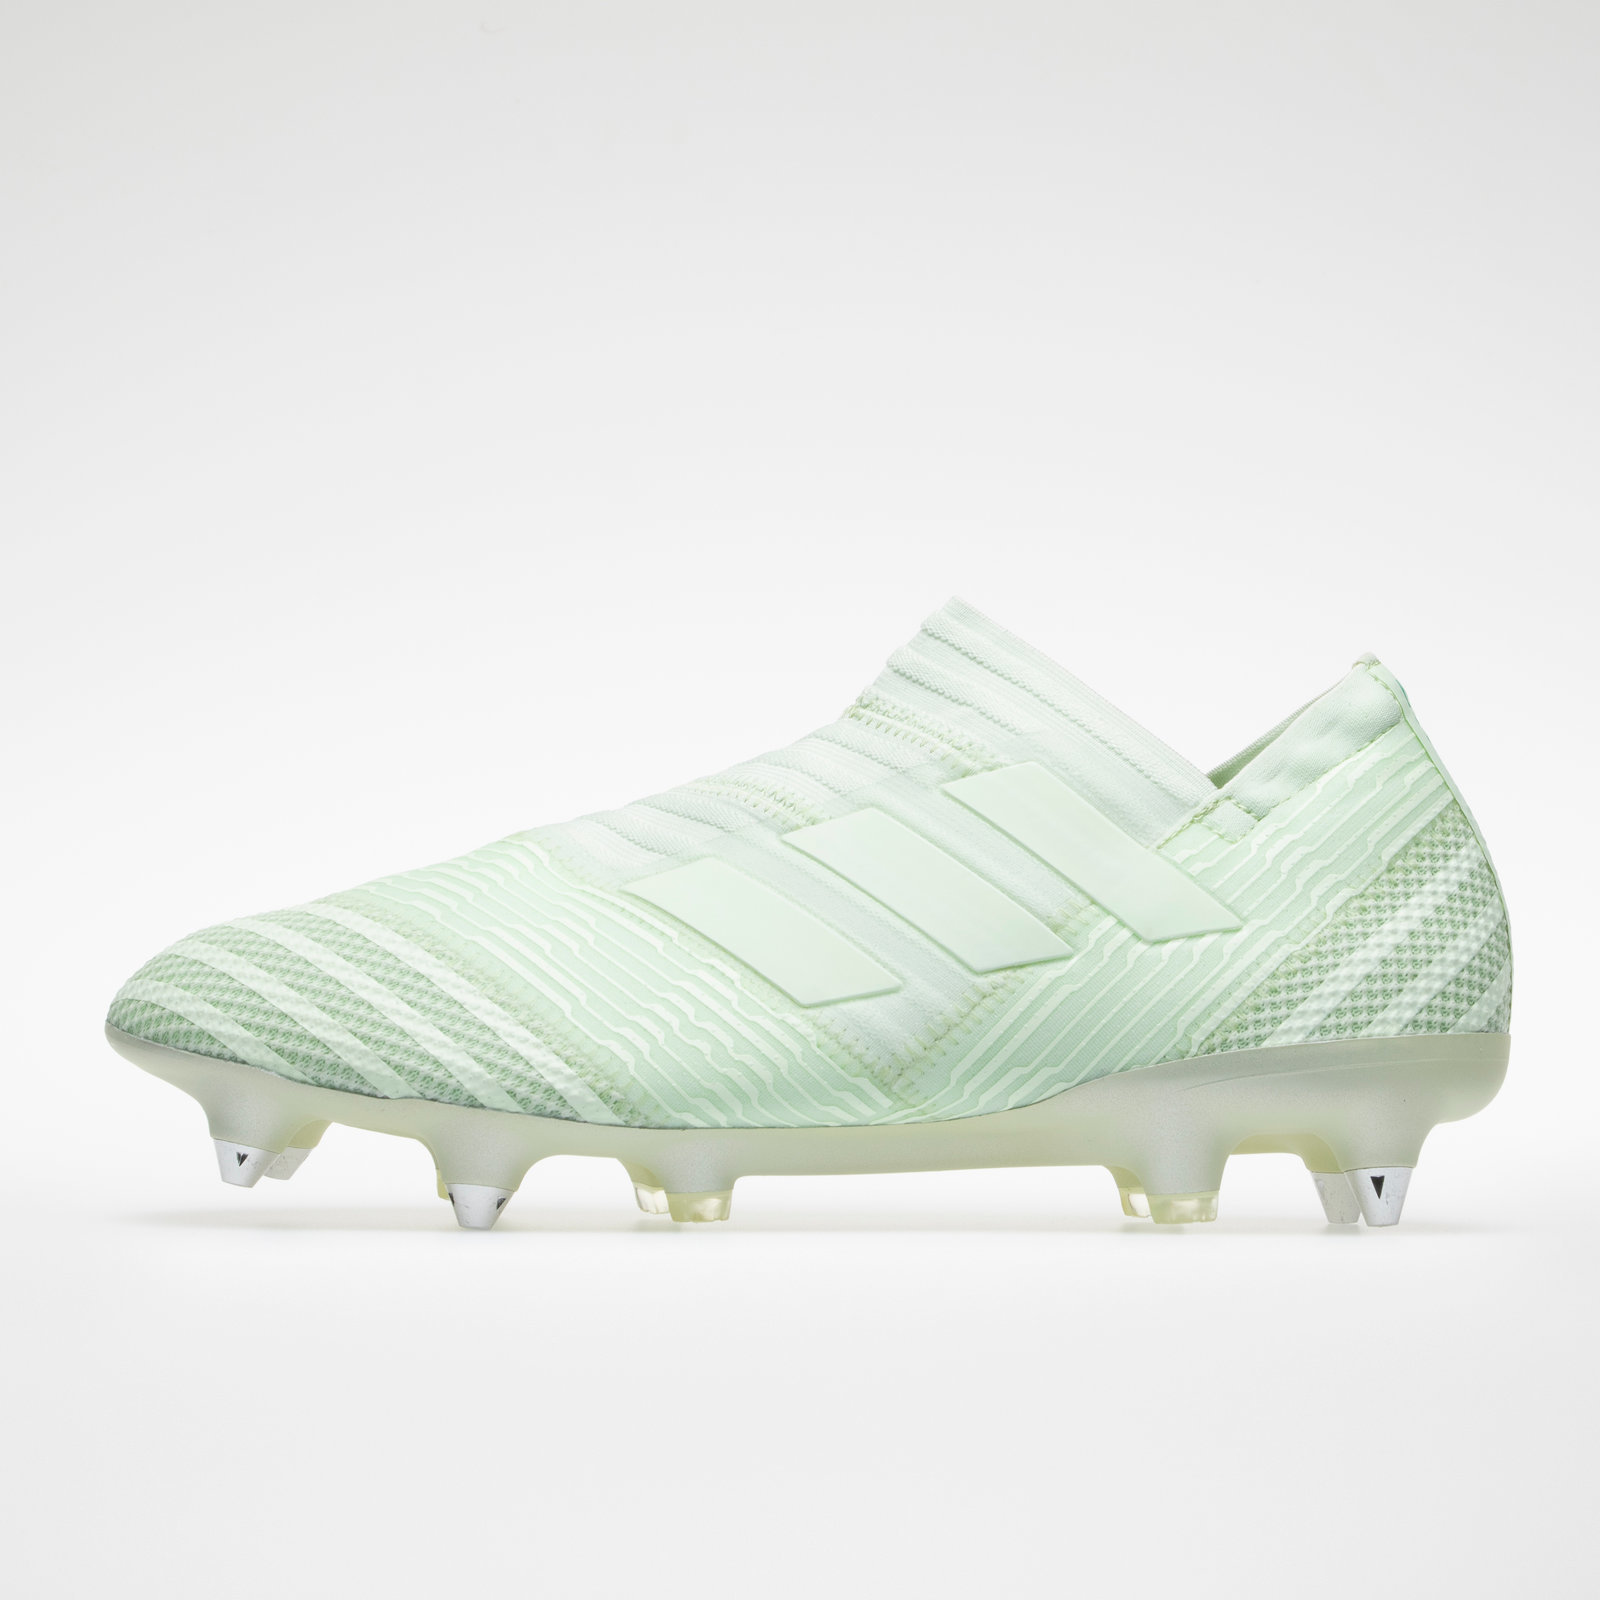 363e41777 adidas Mens Nemeziz 17+ 360 Agility Soft Ground Football Boots Trainers  Sports